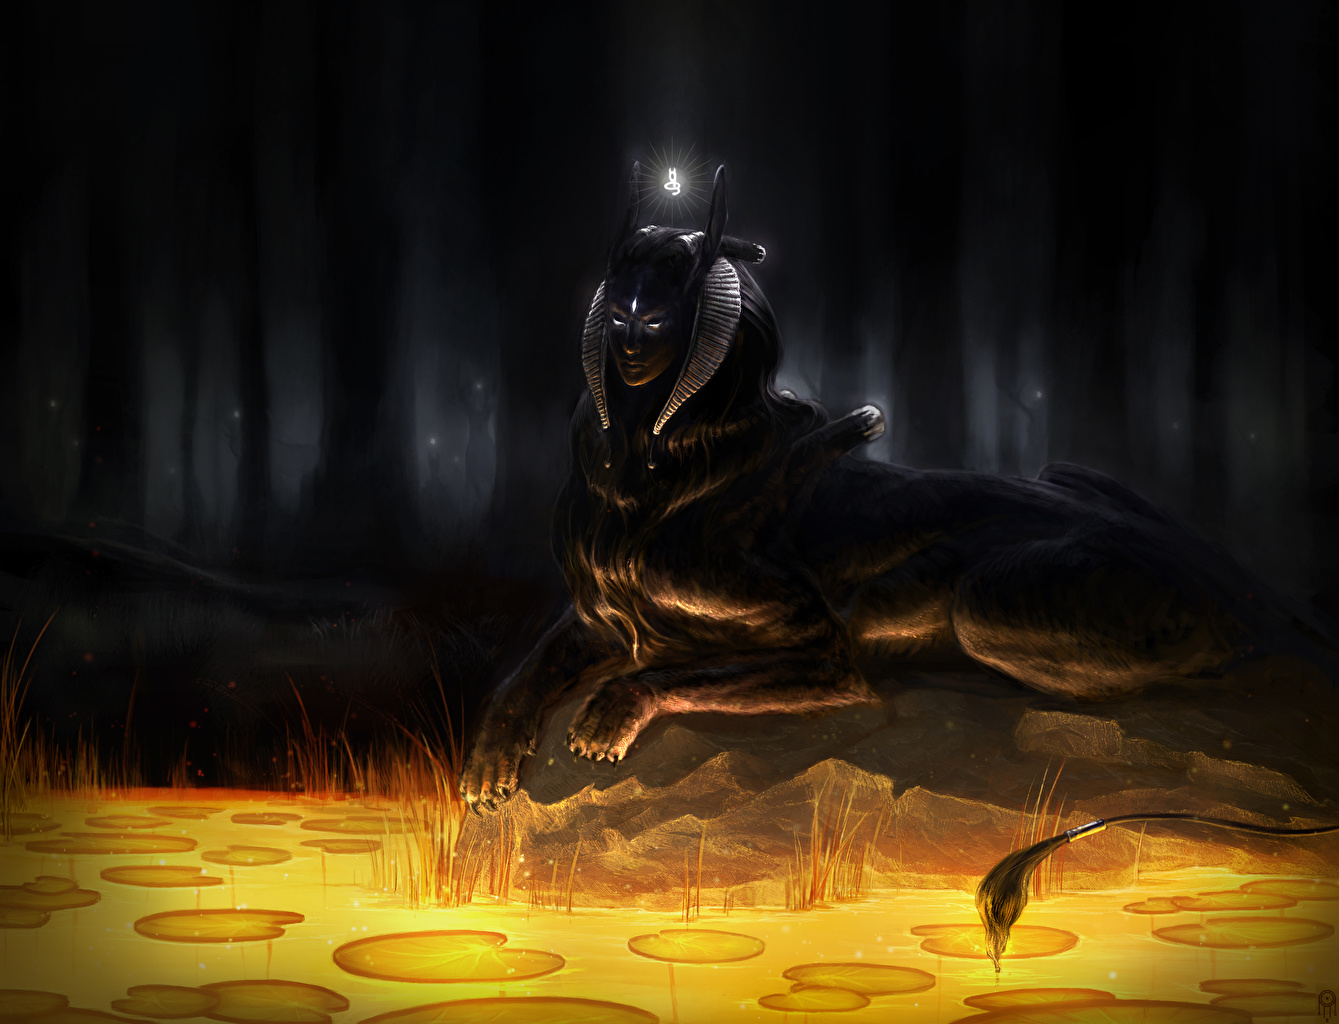 Картинки Фэнтези Сверхъестественные существа Фантастика